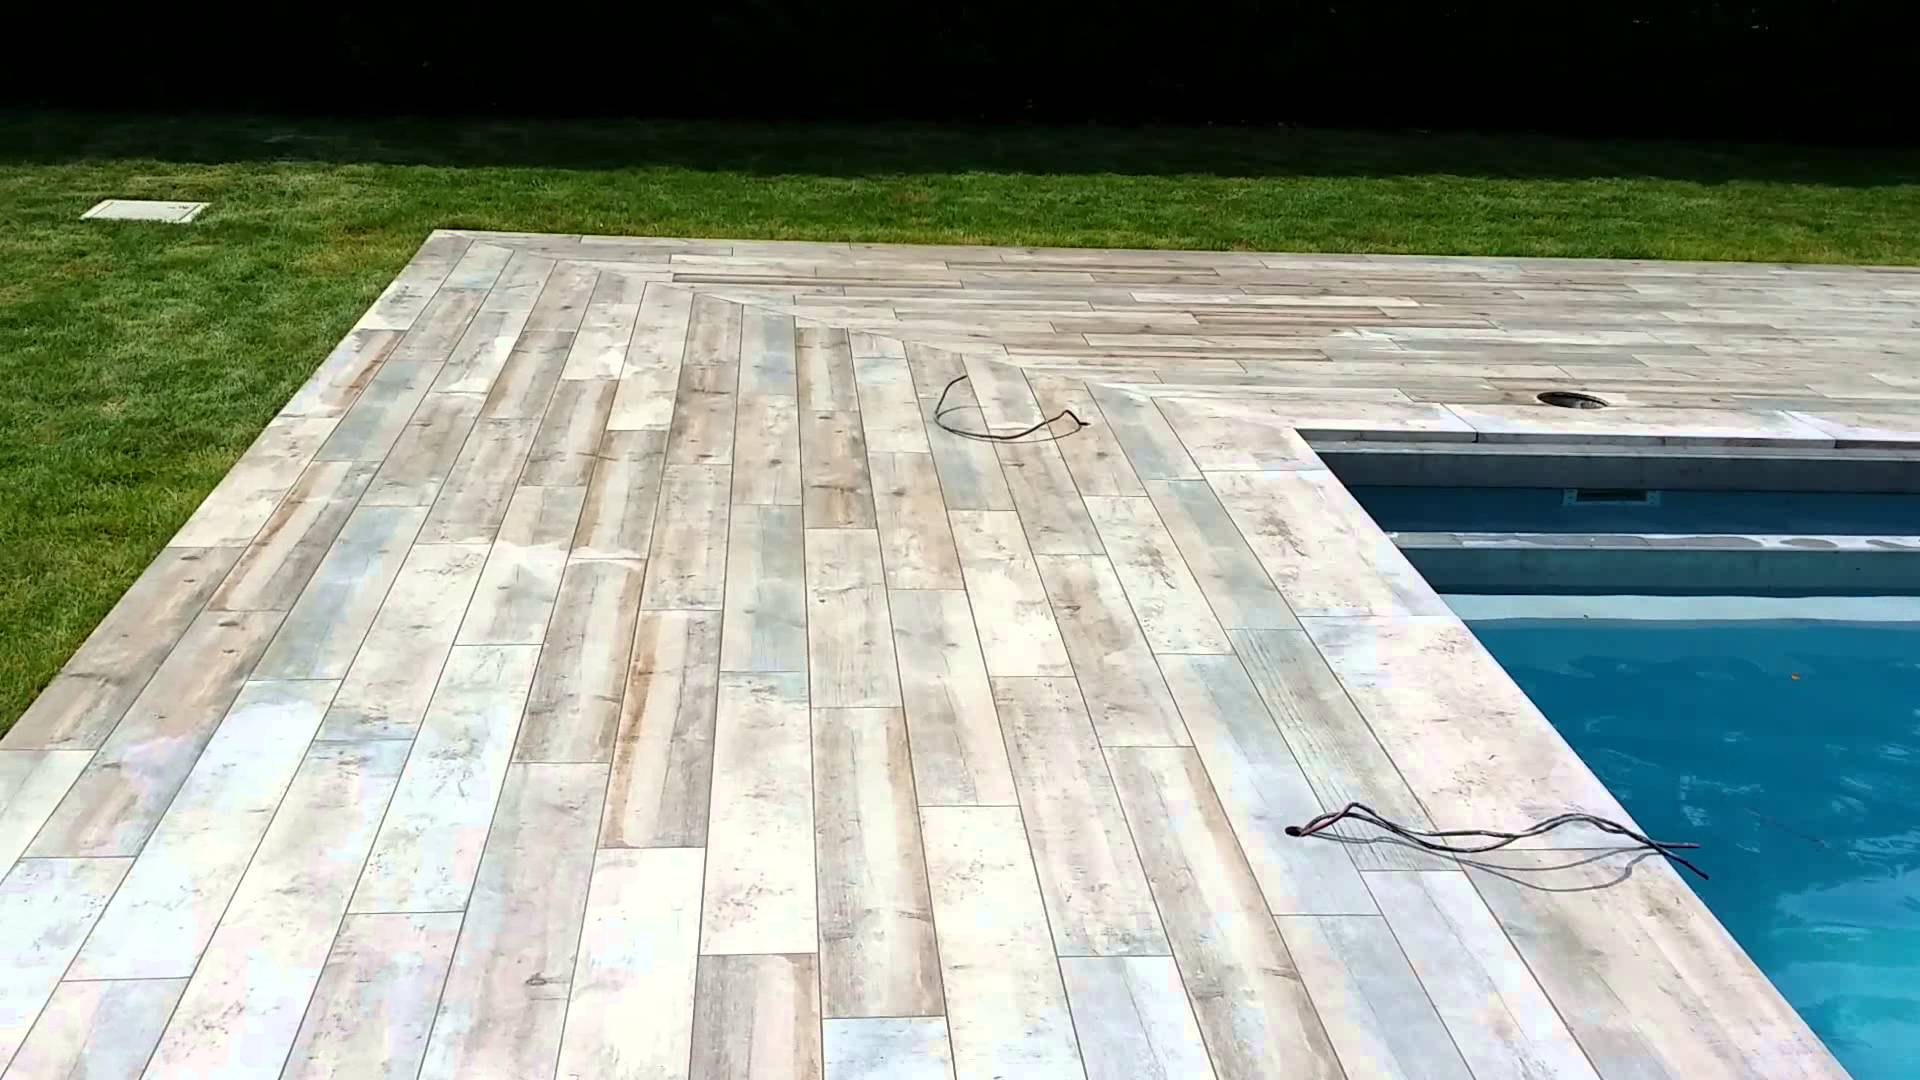 Terrasse piscine imitation bois Nos Conseils # Terrasse Resine Imitation Bois